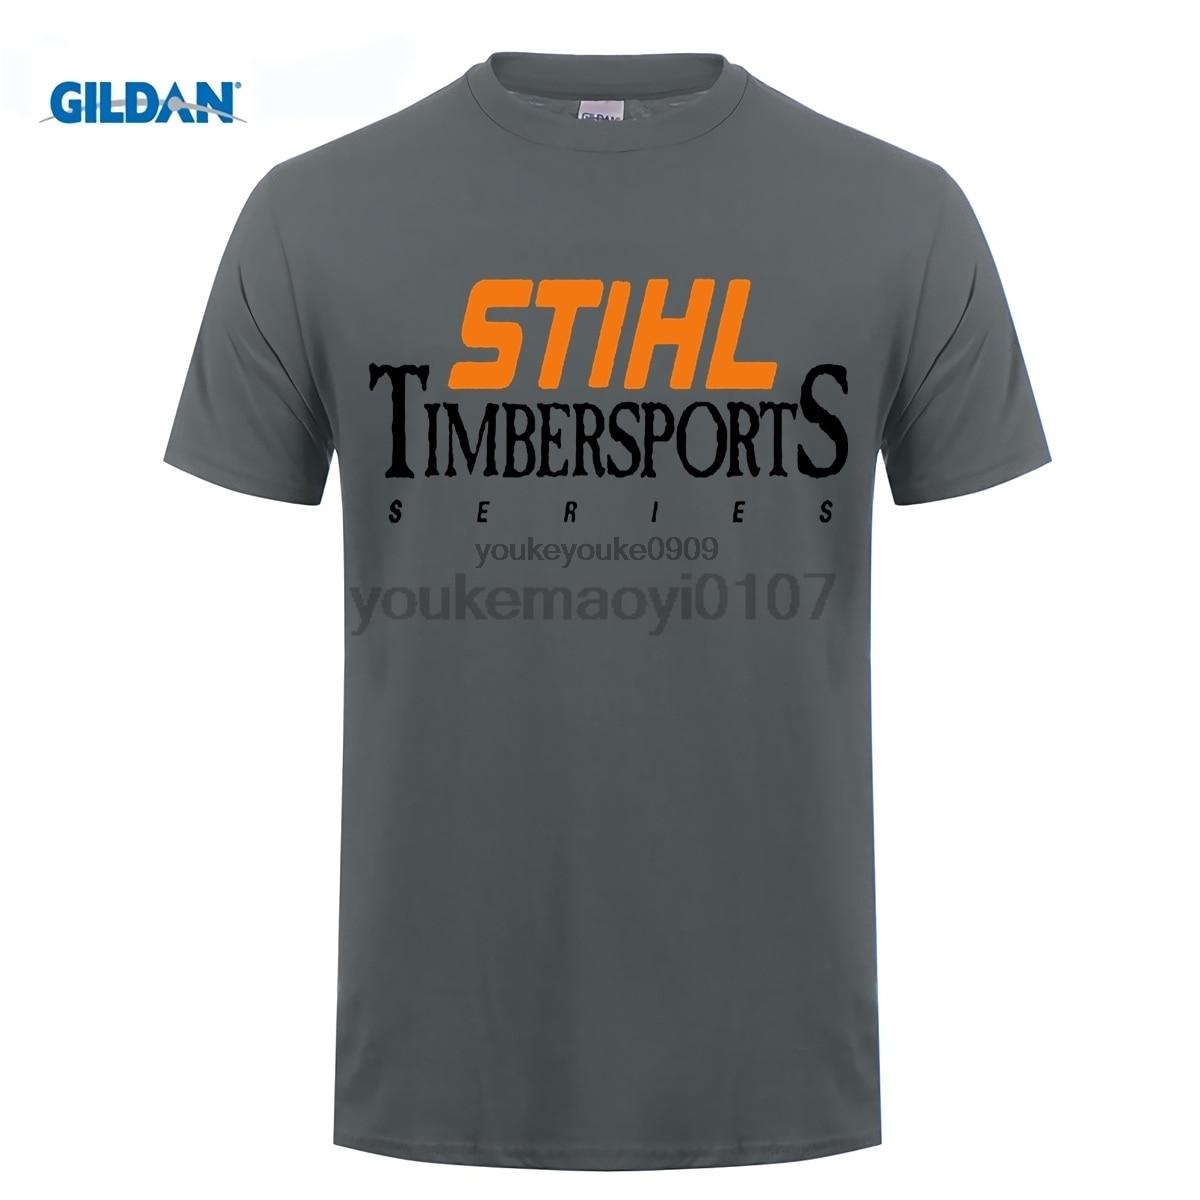 GILDAN Brand T Shirt Man Cotton Mens Stihl Timbersports Series Logo T-shirts